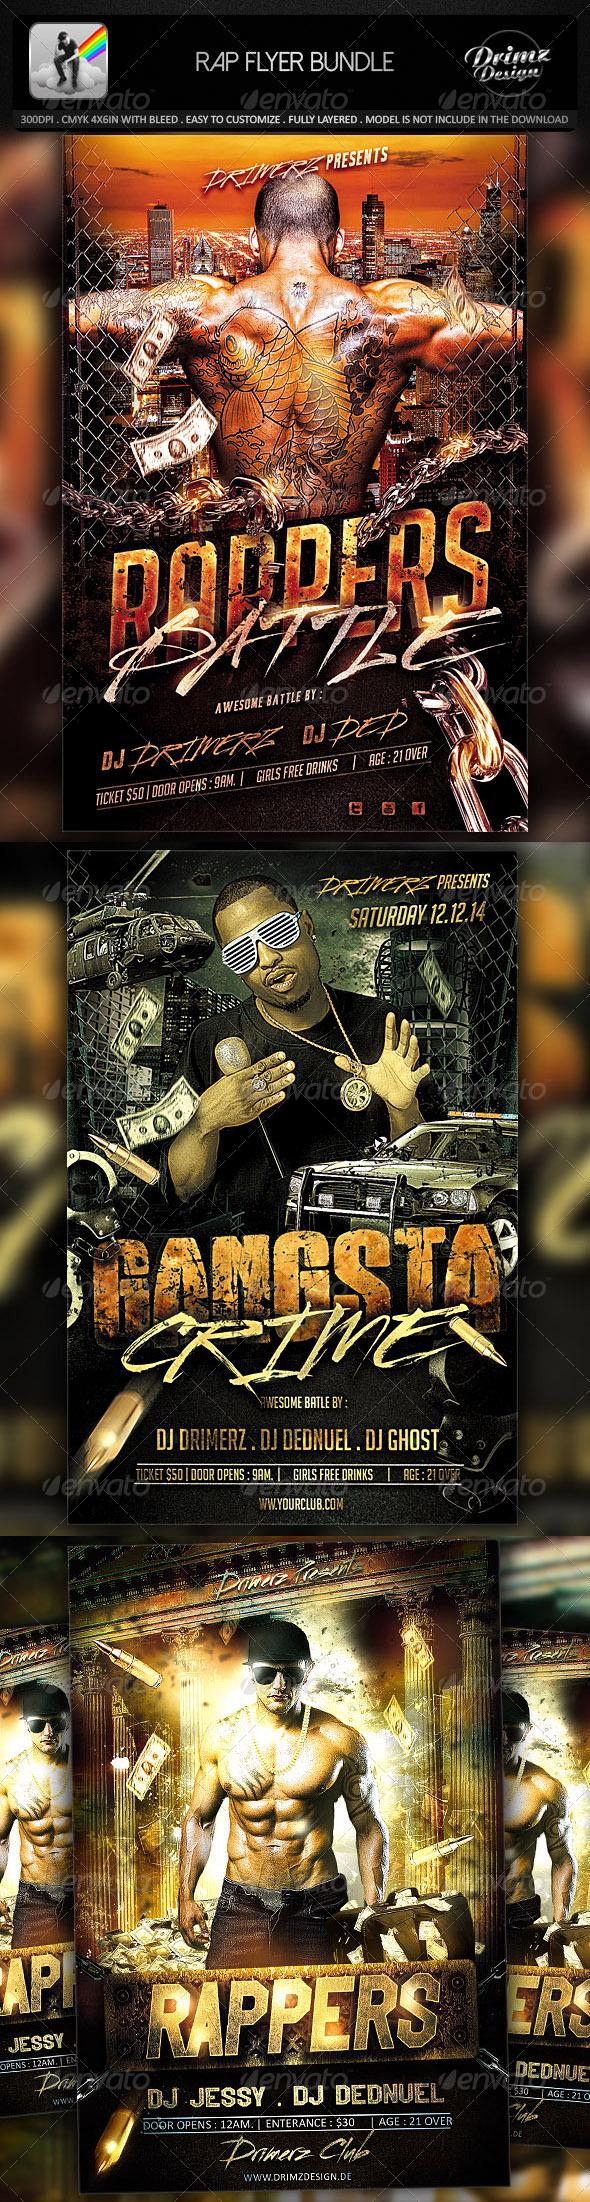 Rap Flyer Bundle